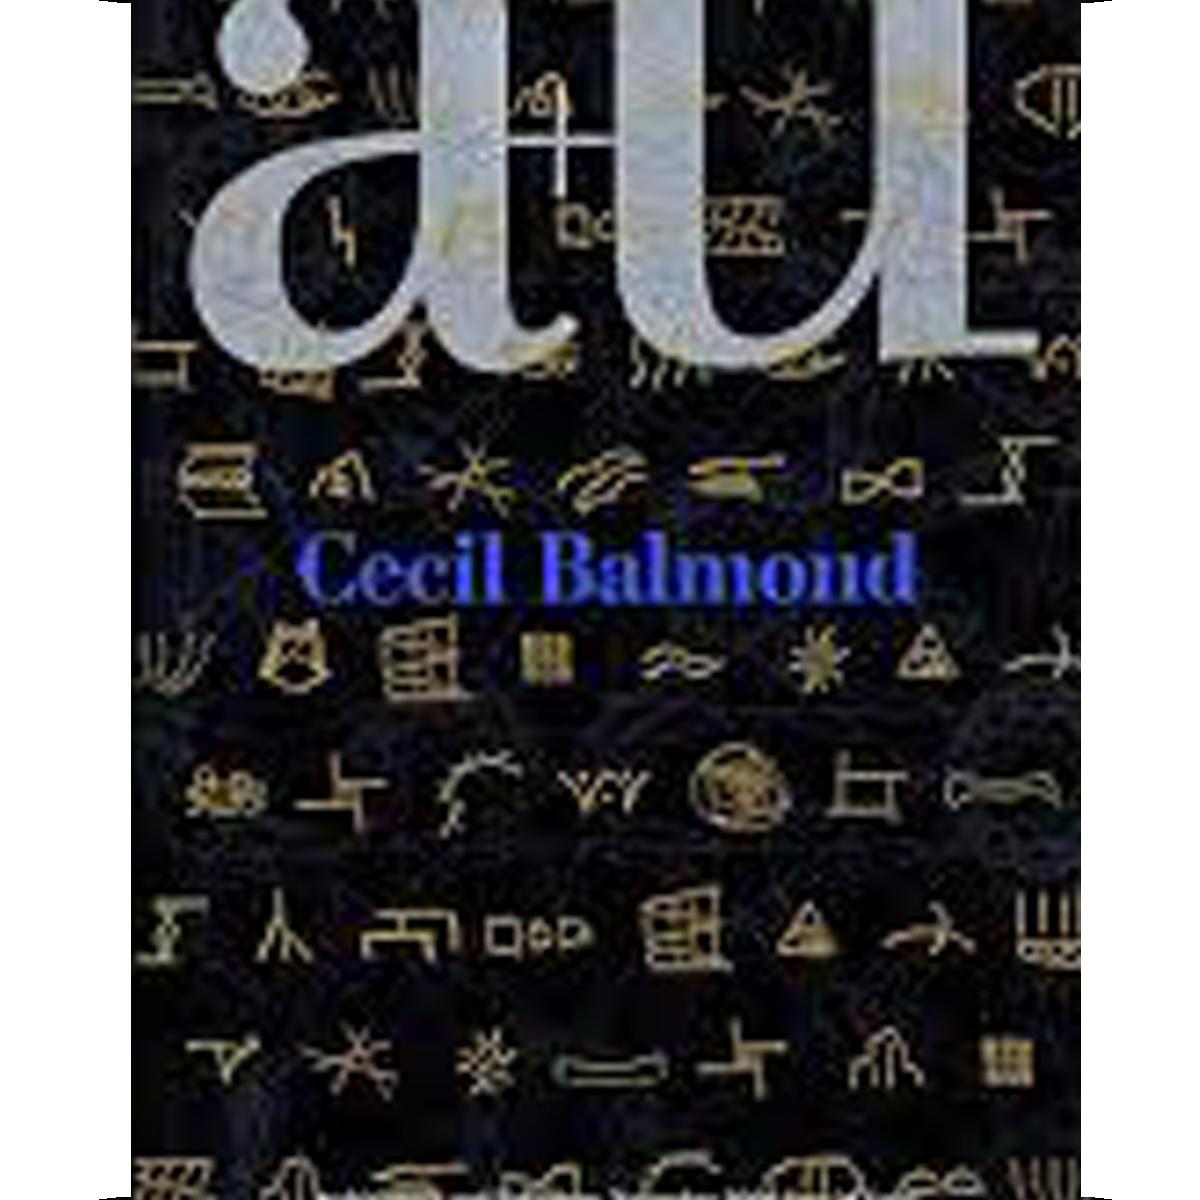 a+u: Cecil Balmond